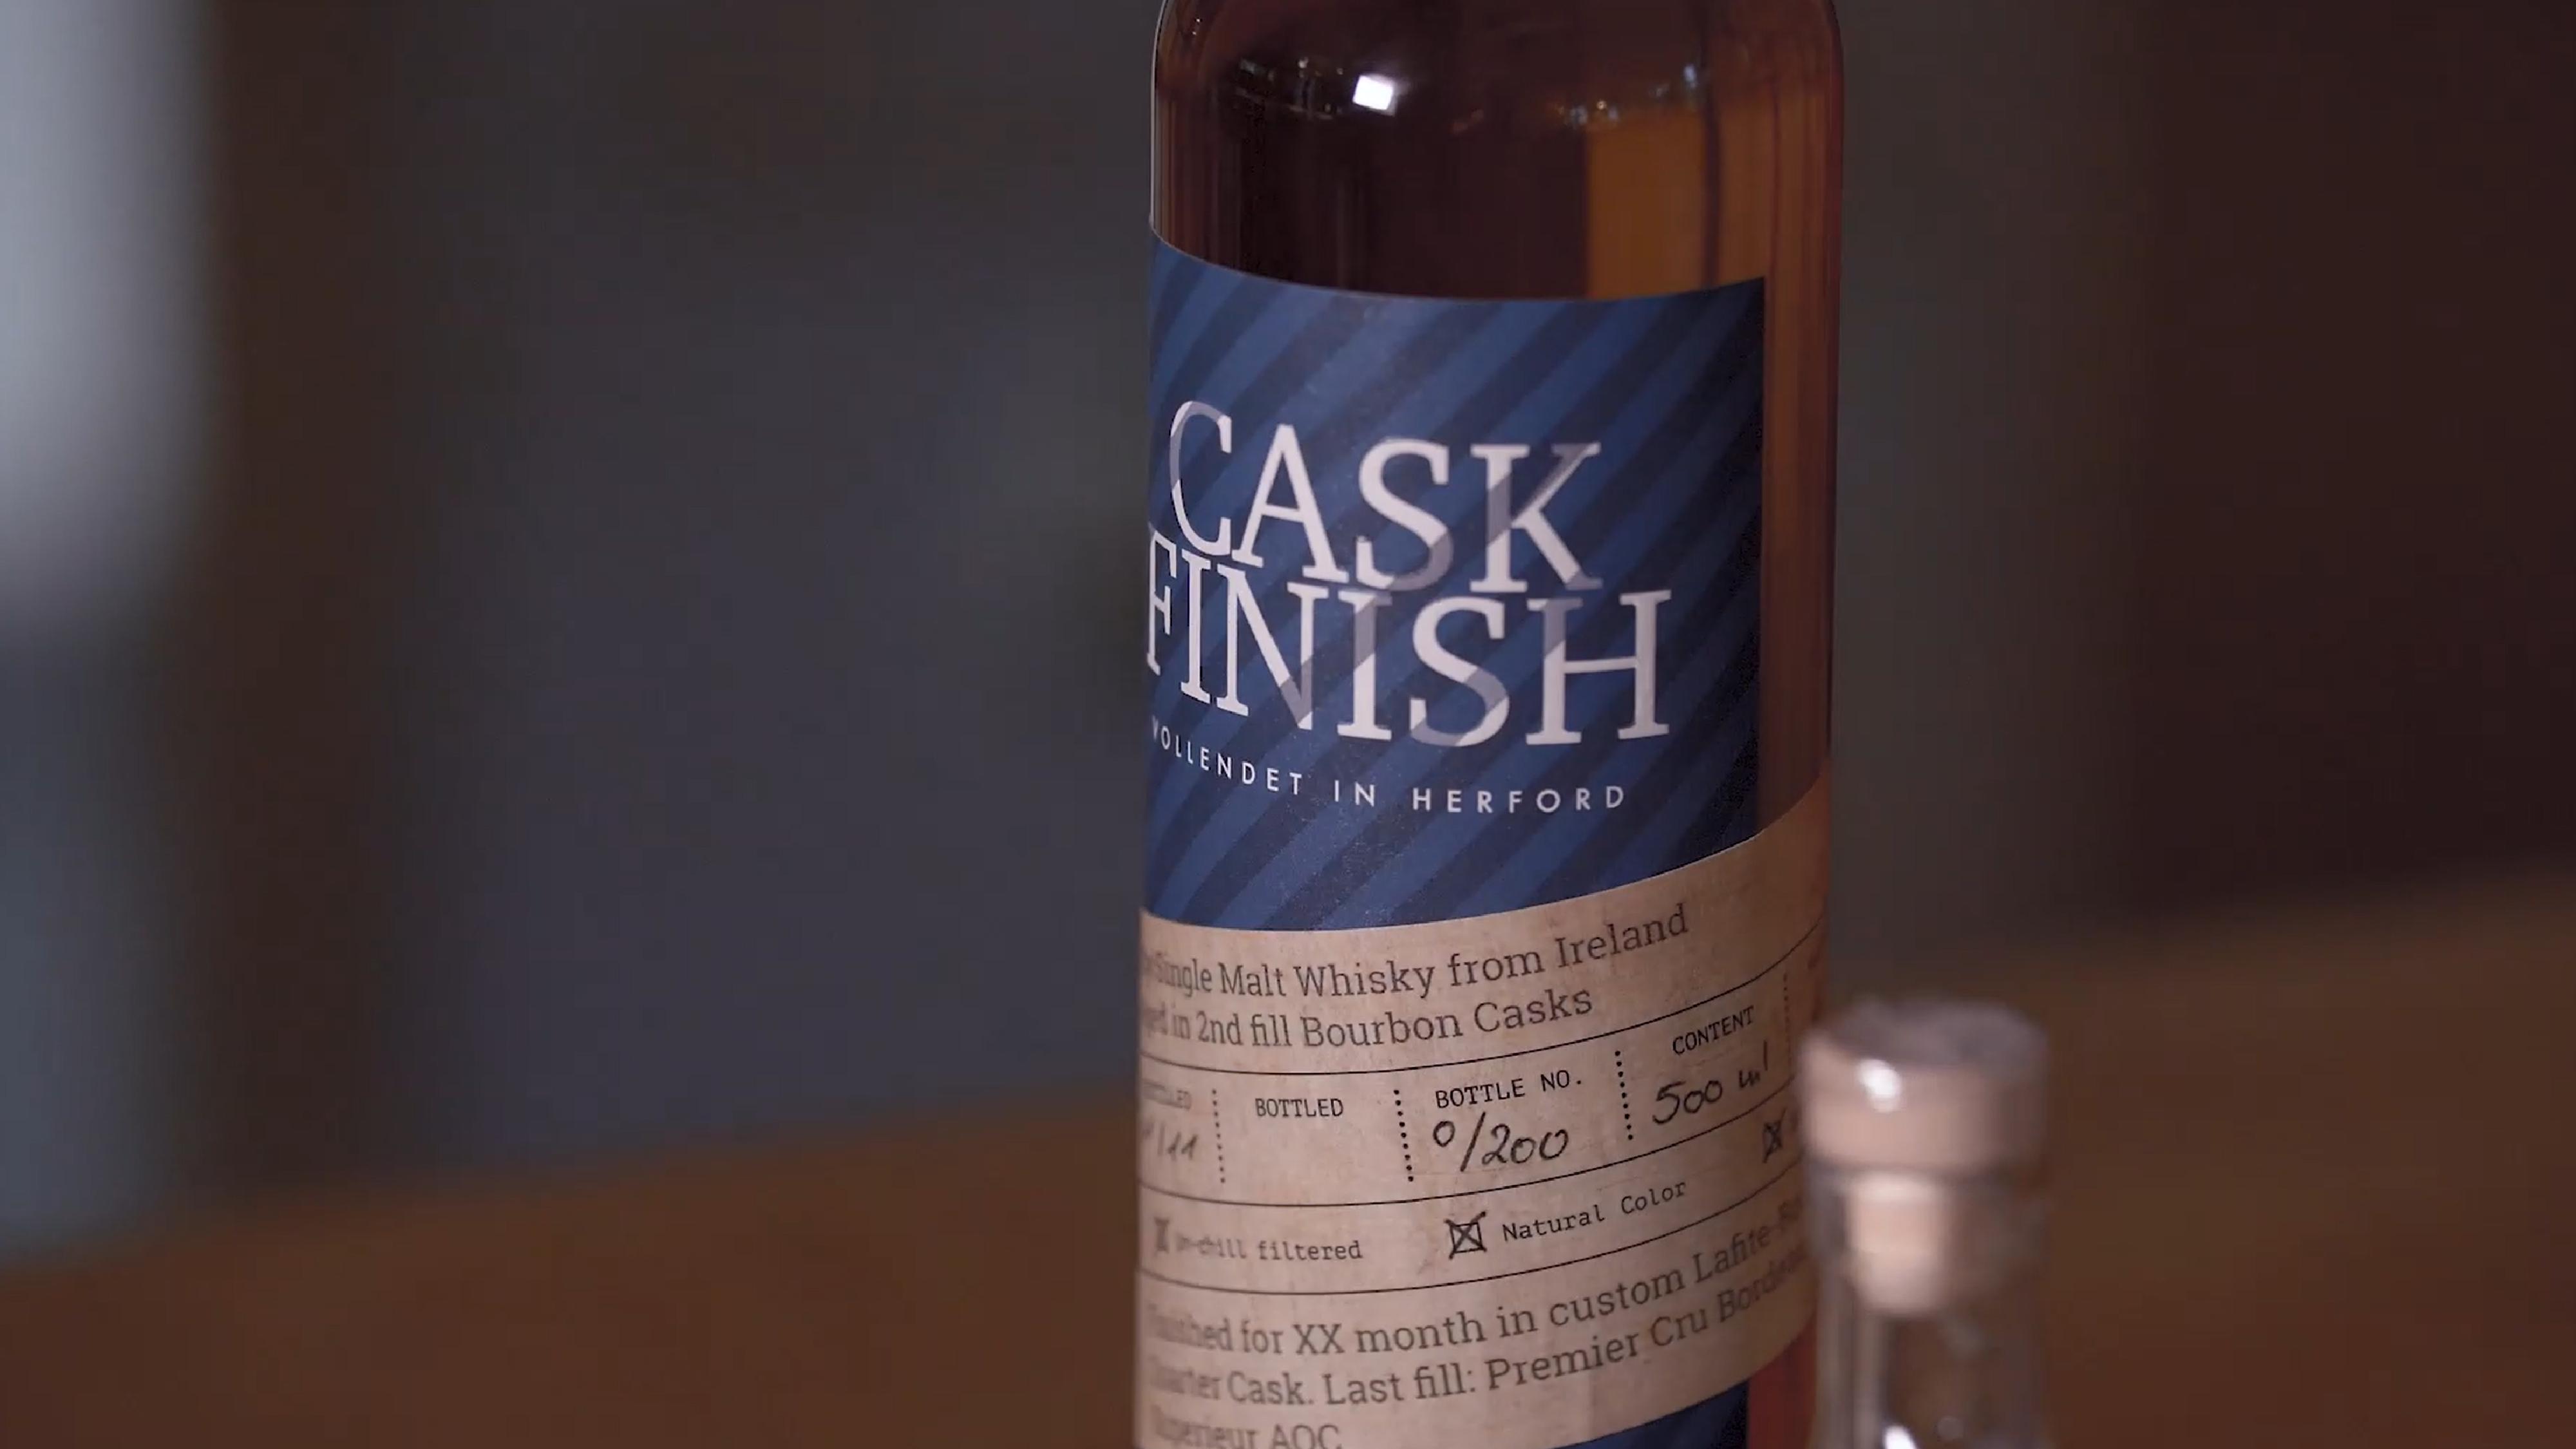 Cask Finish - Single Malt Whisky